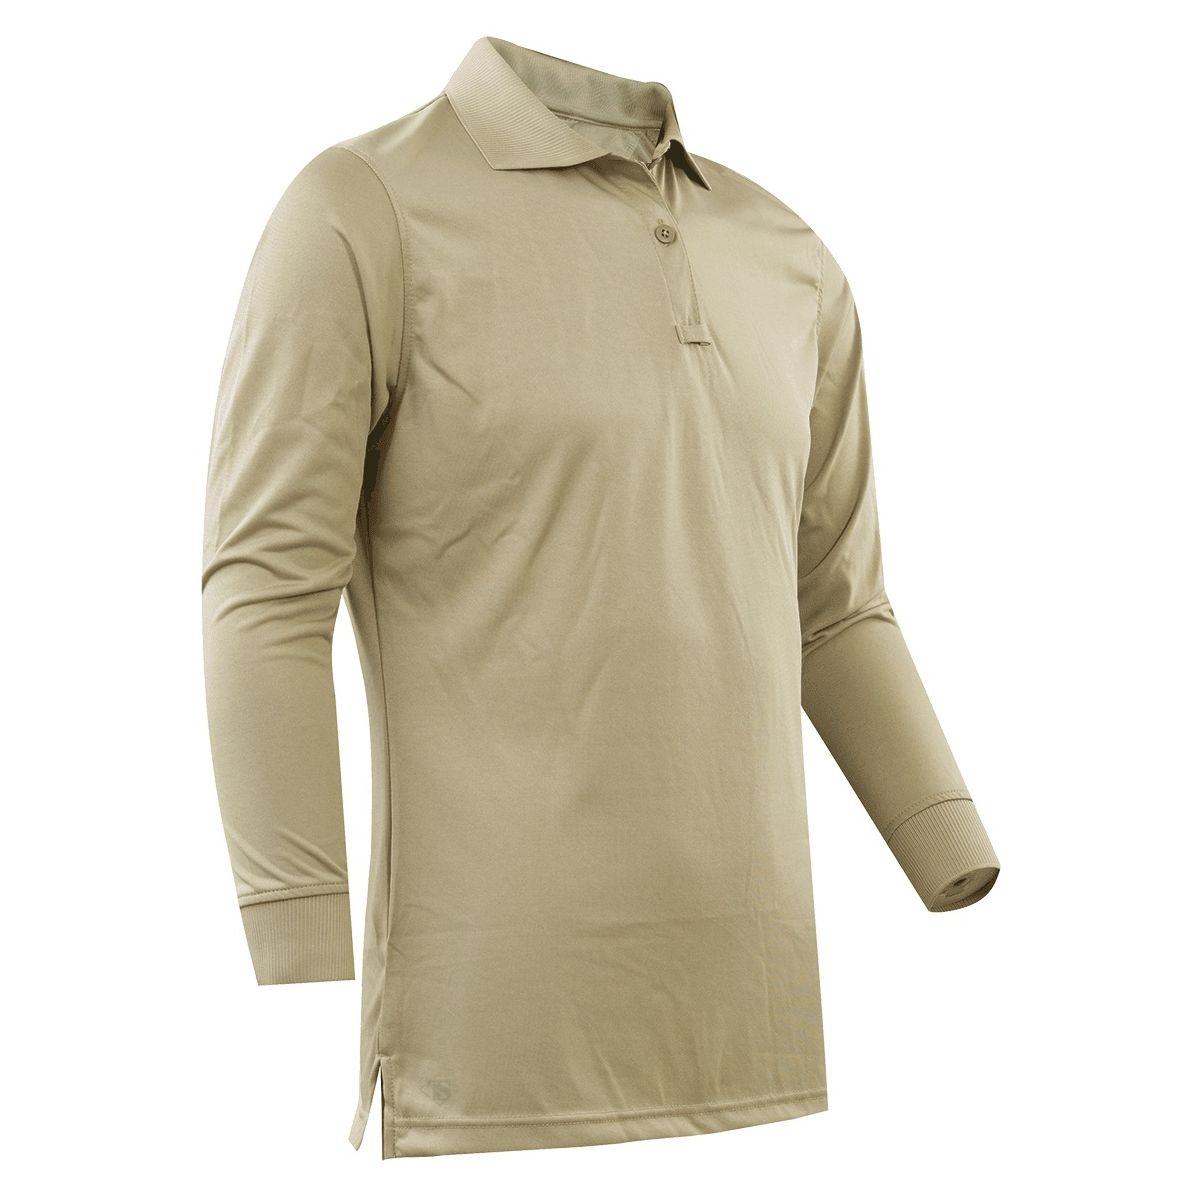 Polo womens long sleeve 24-7 PERFORMANCE SILVER TAN TRU-SPEC 24-7 44870 L-11